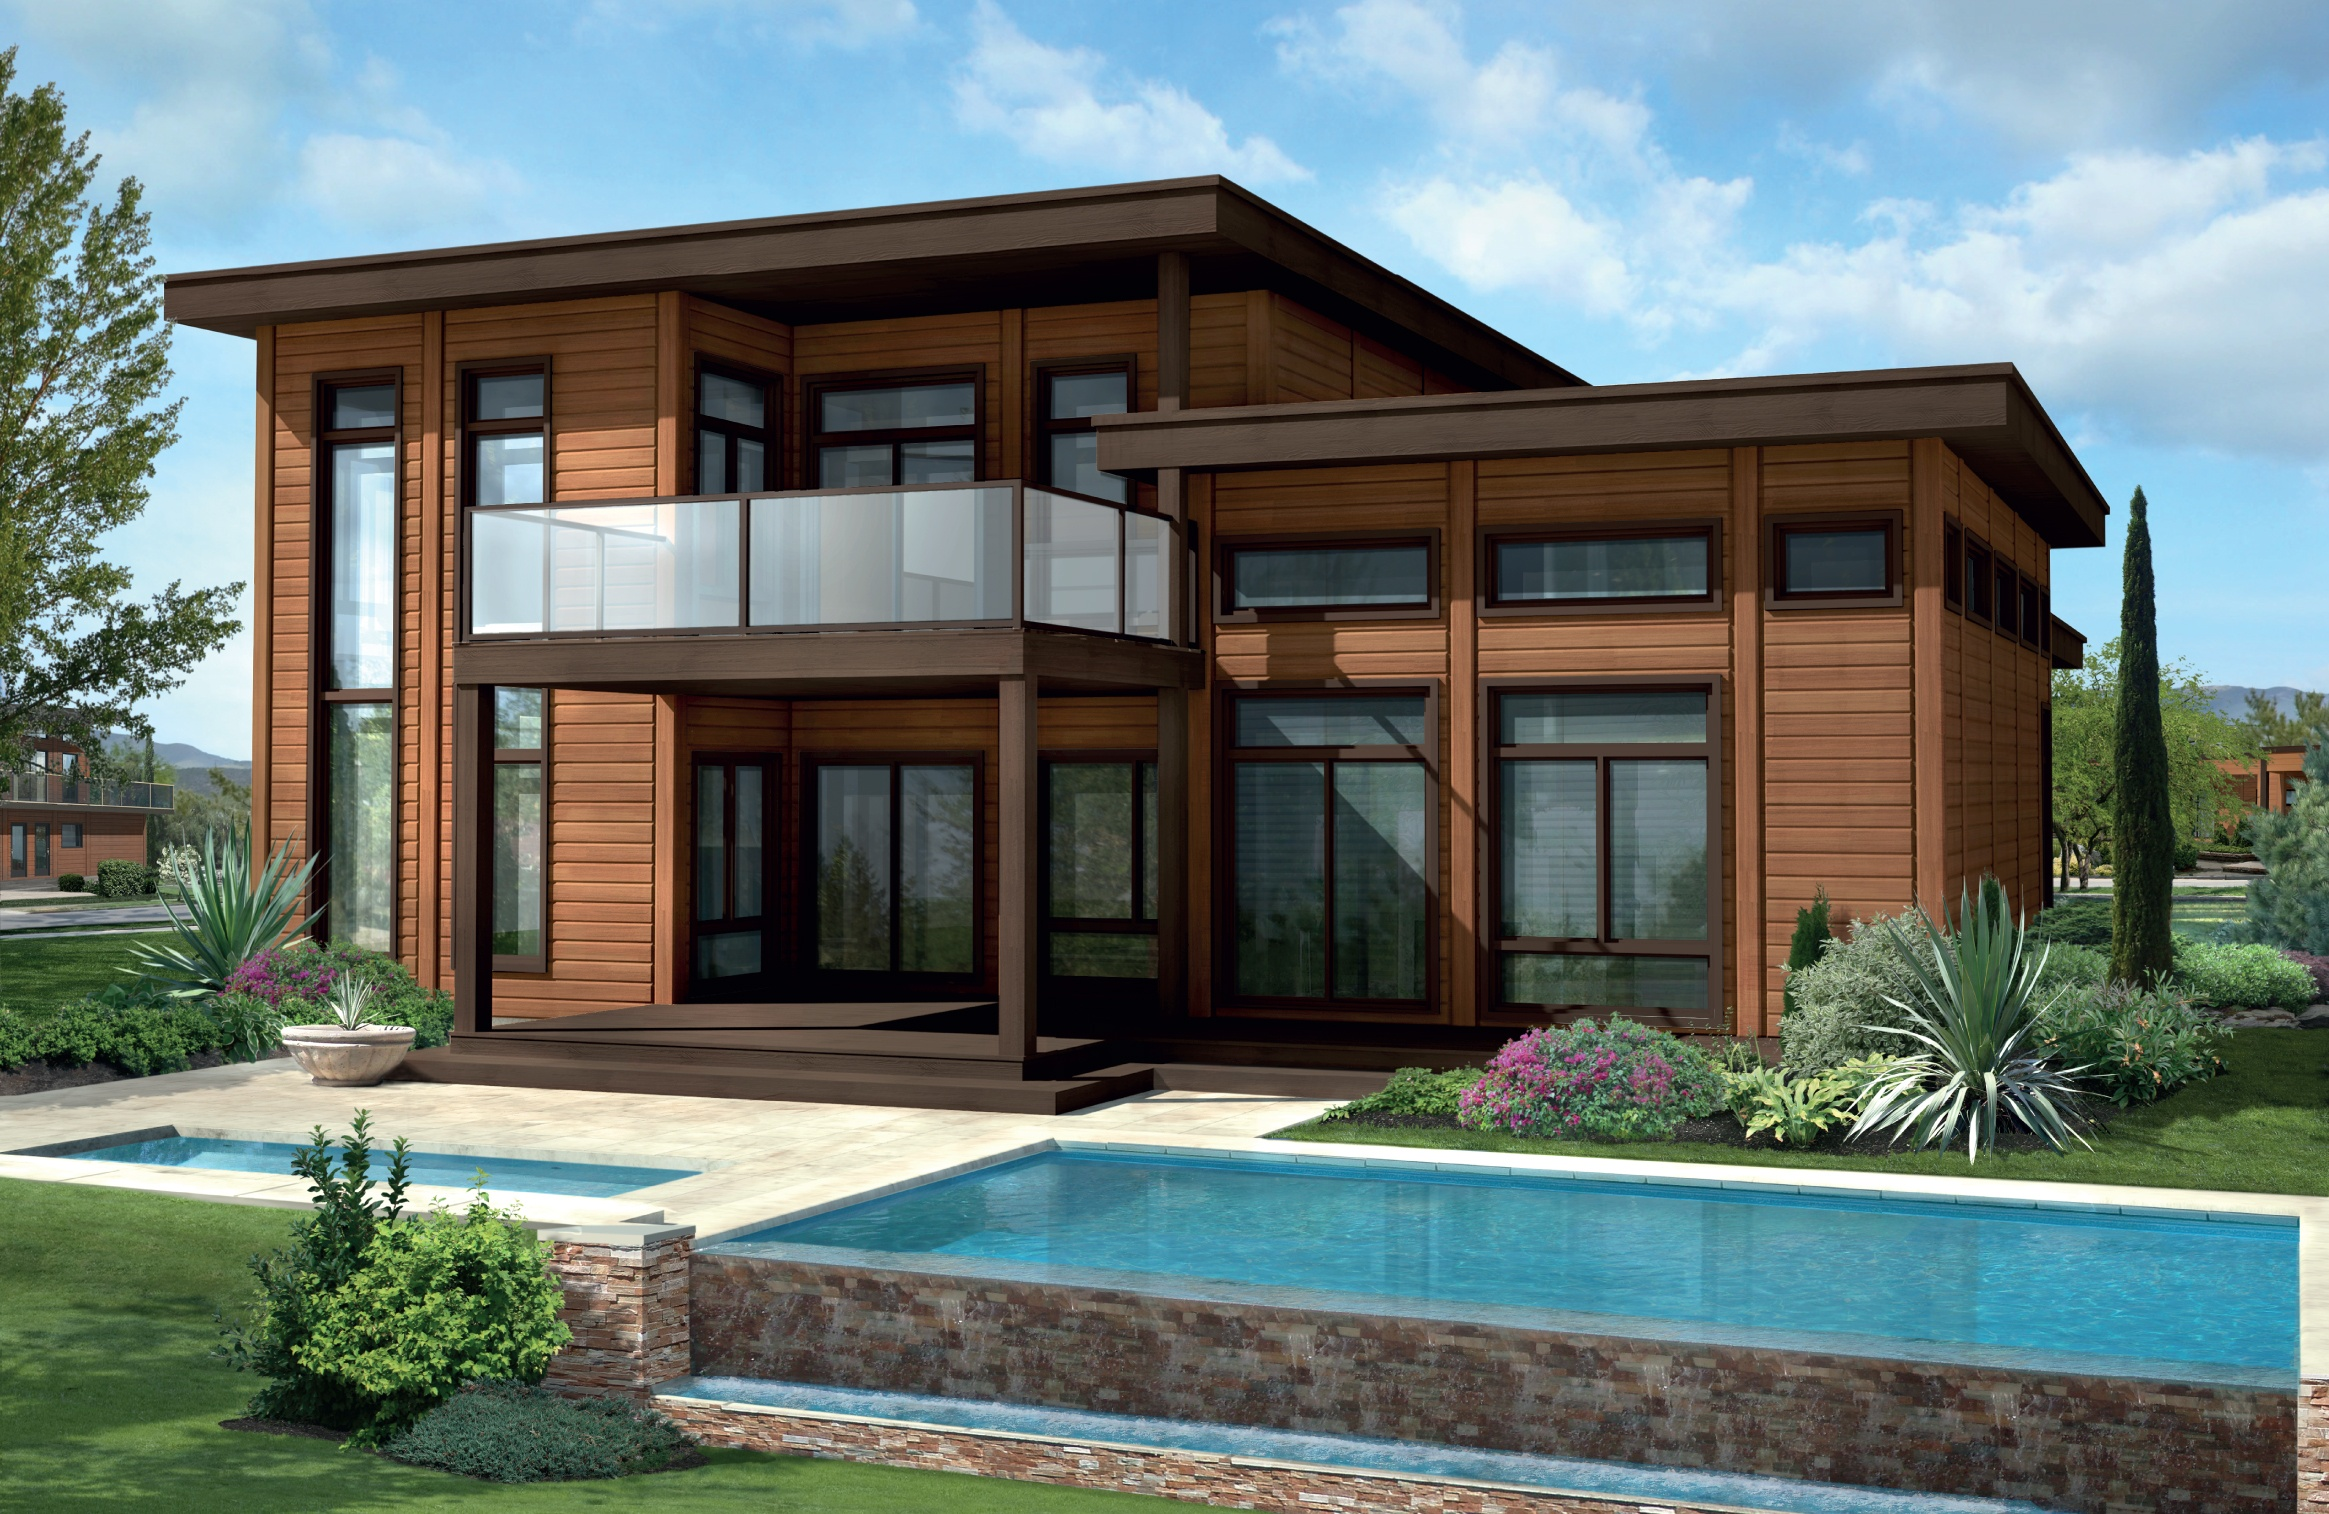 Timber Block Sierra Vista Model Home